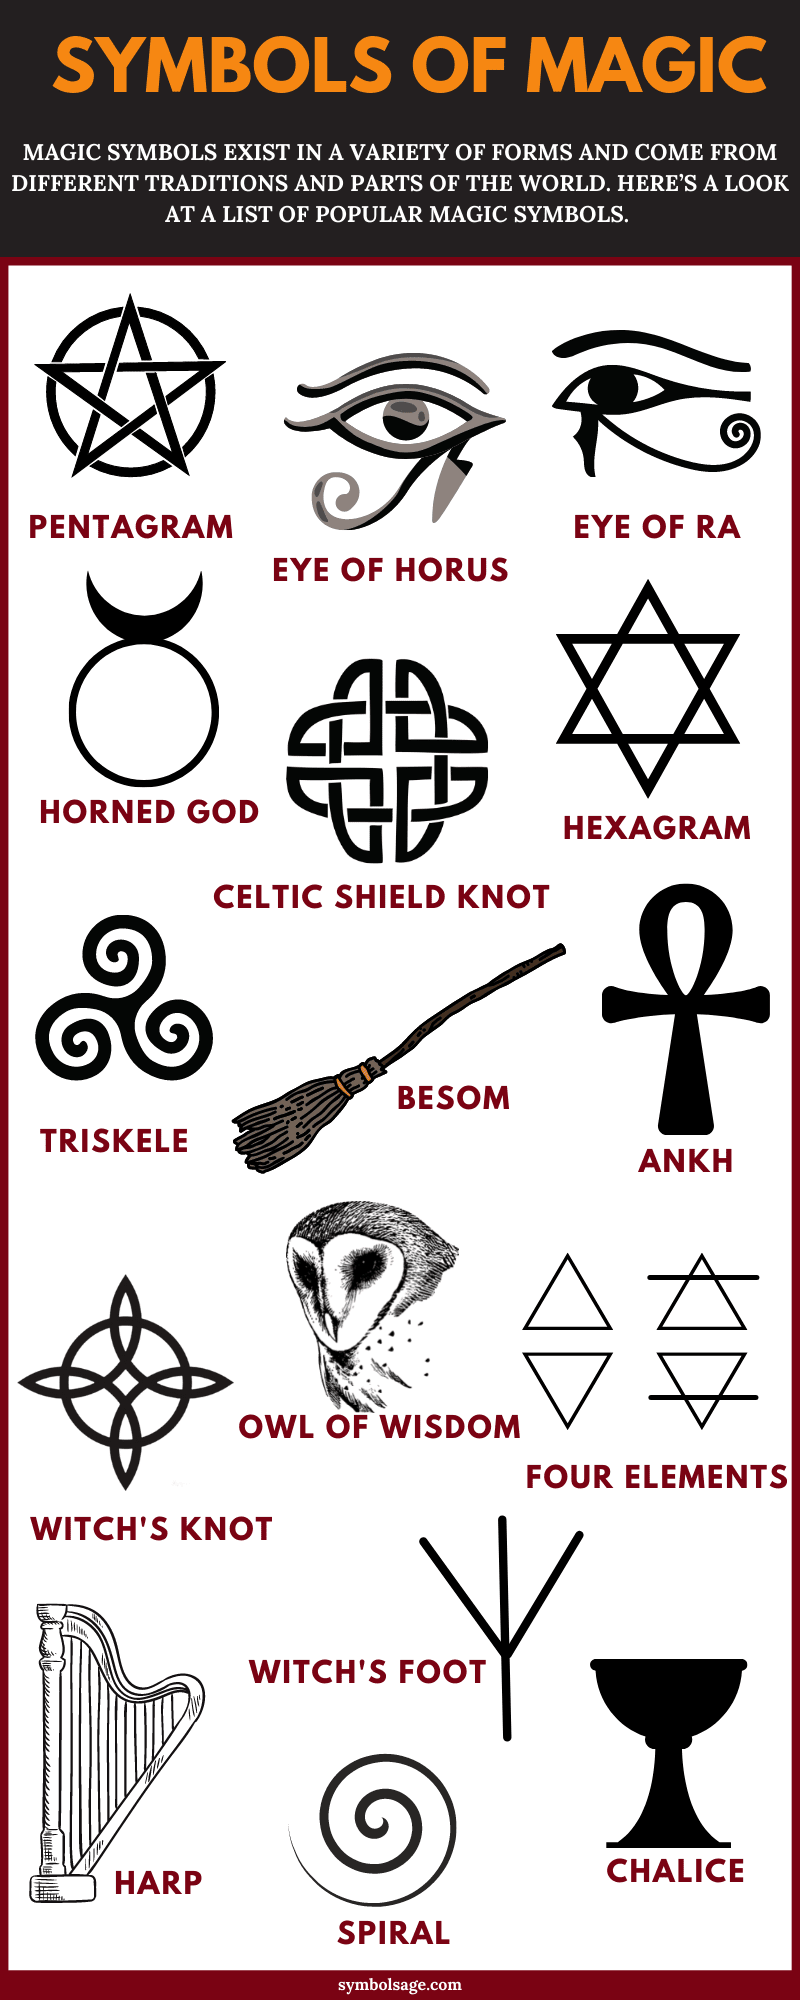 Symbols of magic